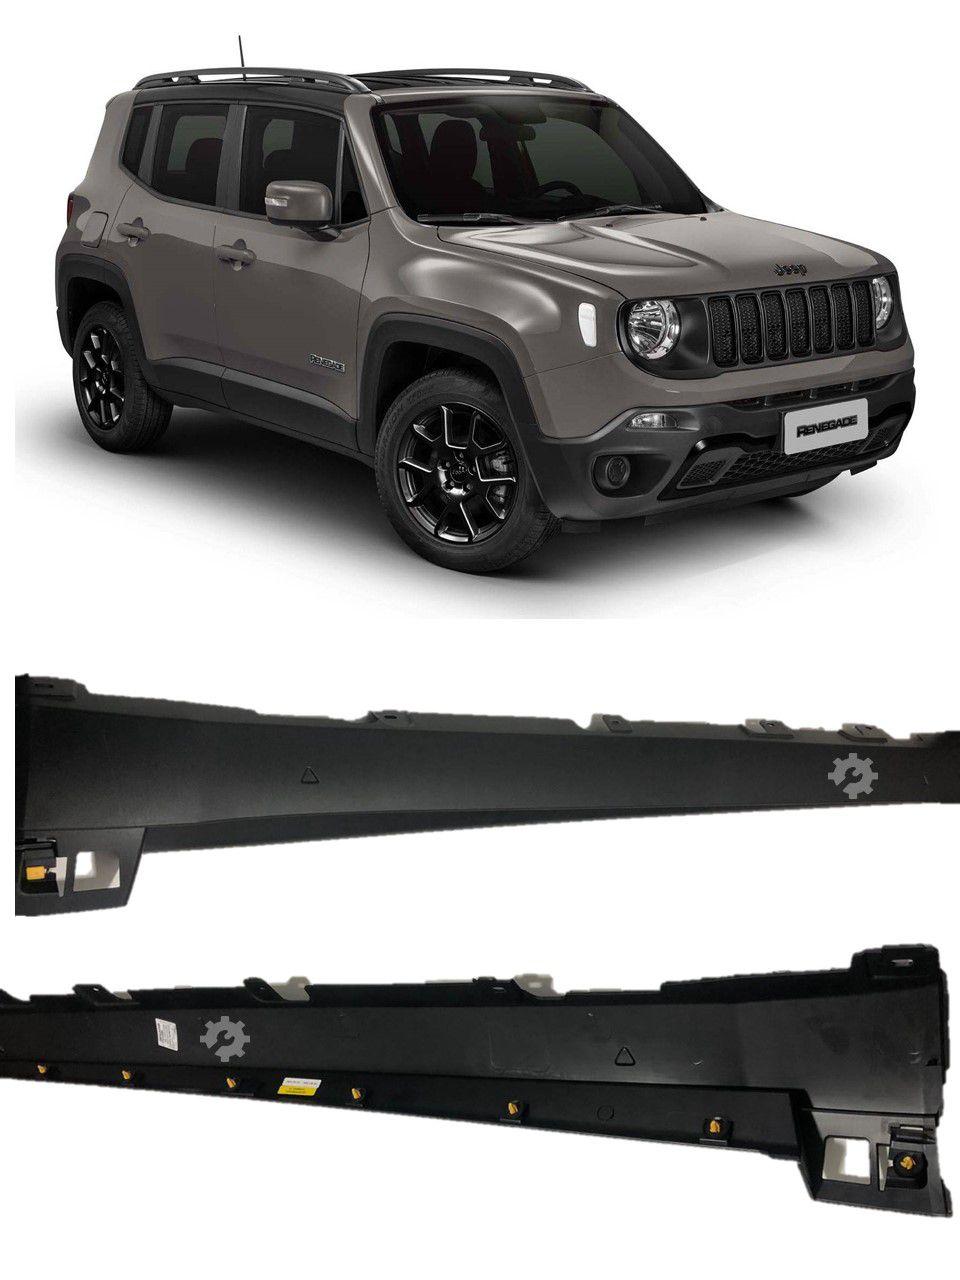 Moldura Lateral Externa Direita Jeep Renegade 2015 2018 2019 Original